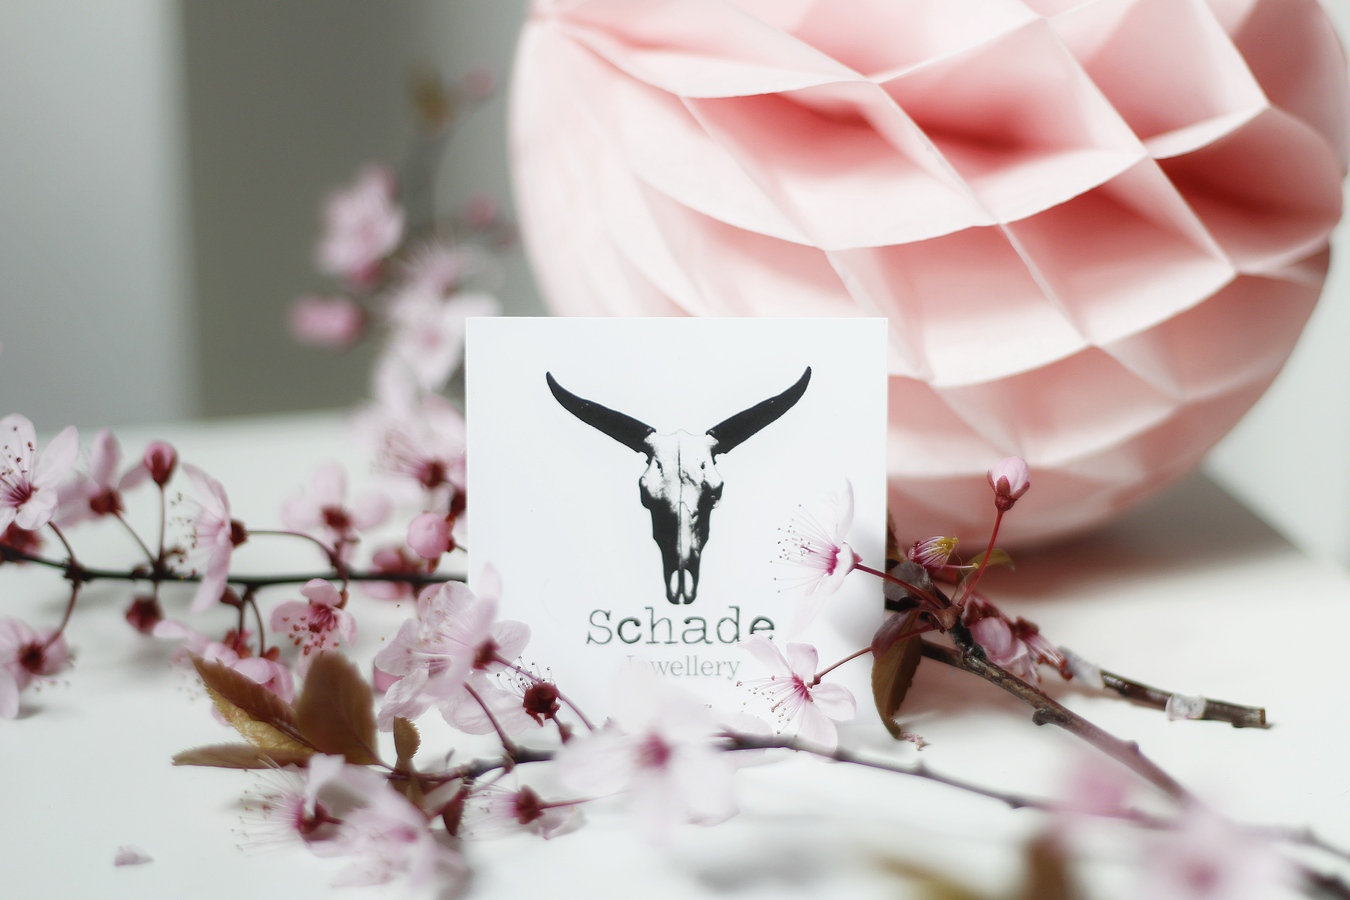 emma et chloé février - box bijoux - promo - bijoux - schade jewellery - avis - bague